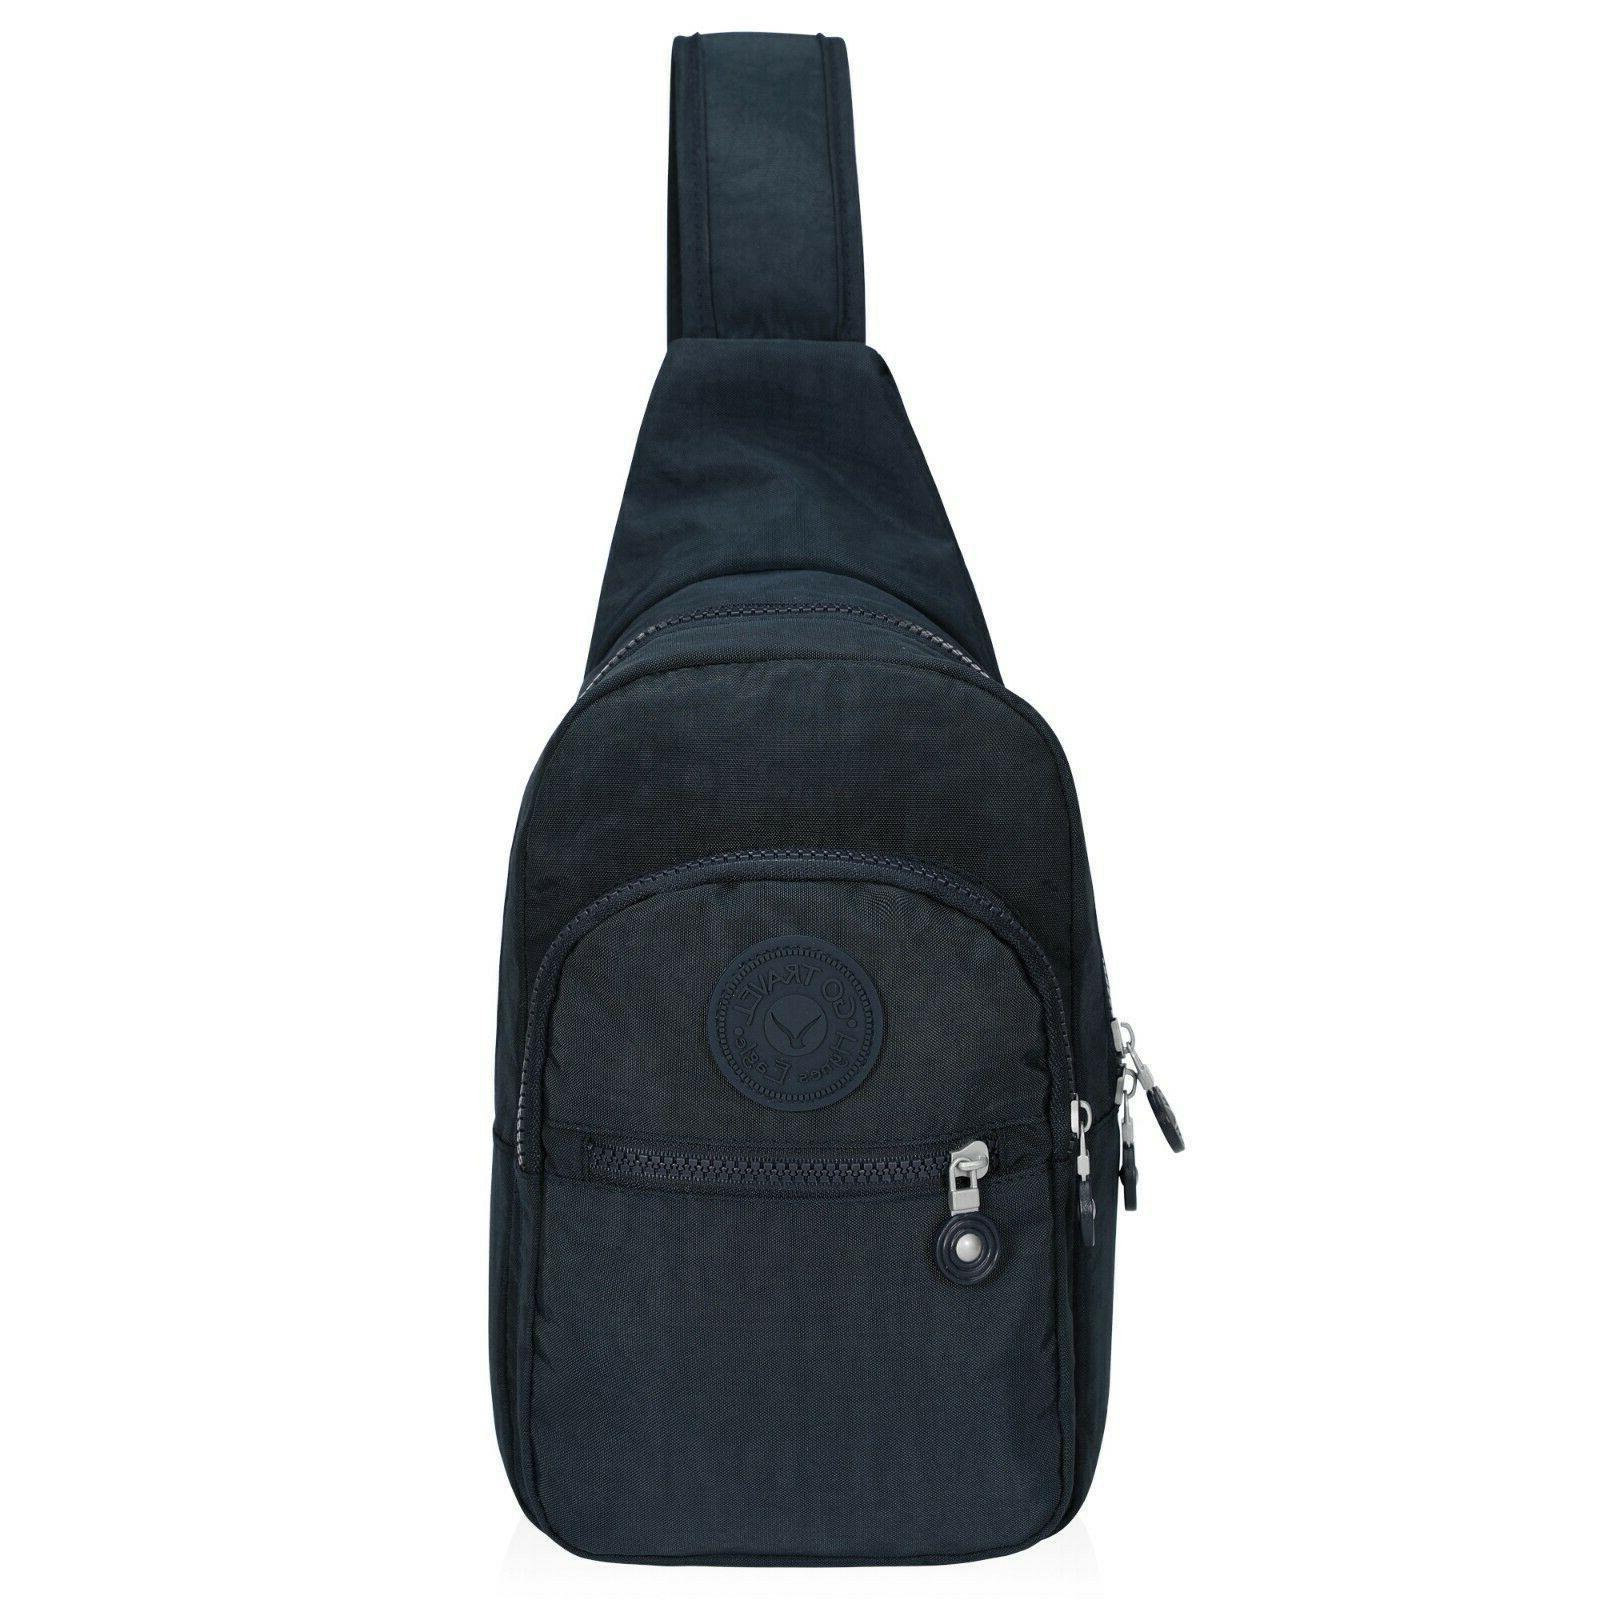 Hynes Sling Multipurpose Crossbody Backpack Shoulder Pack